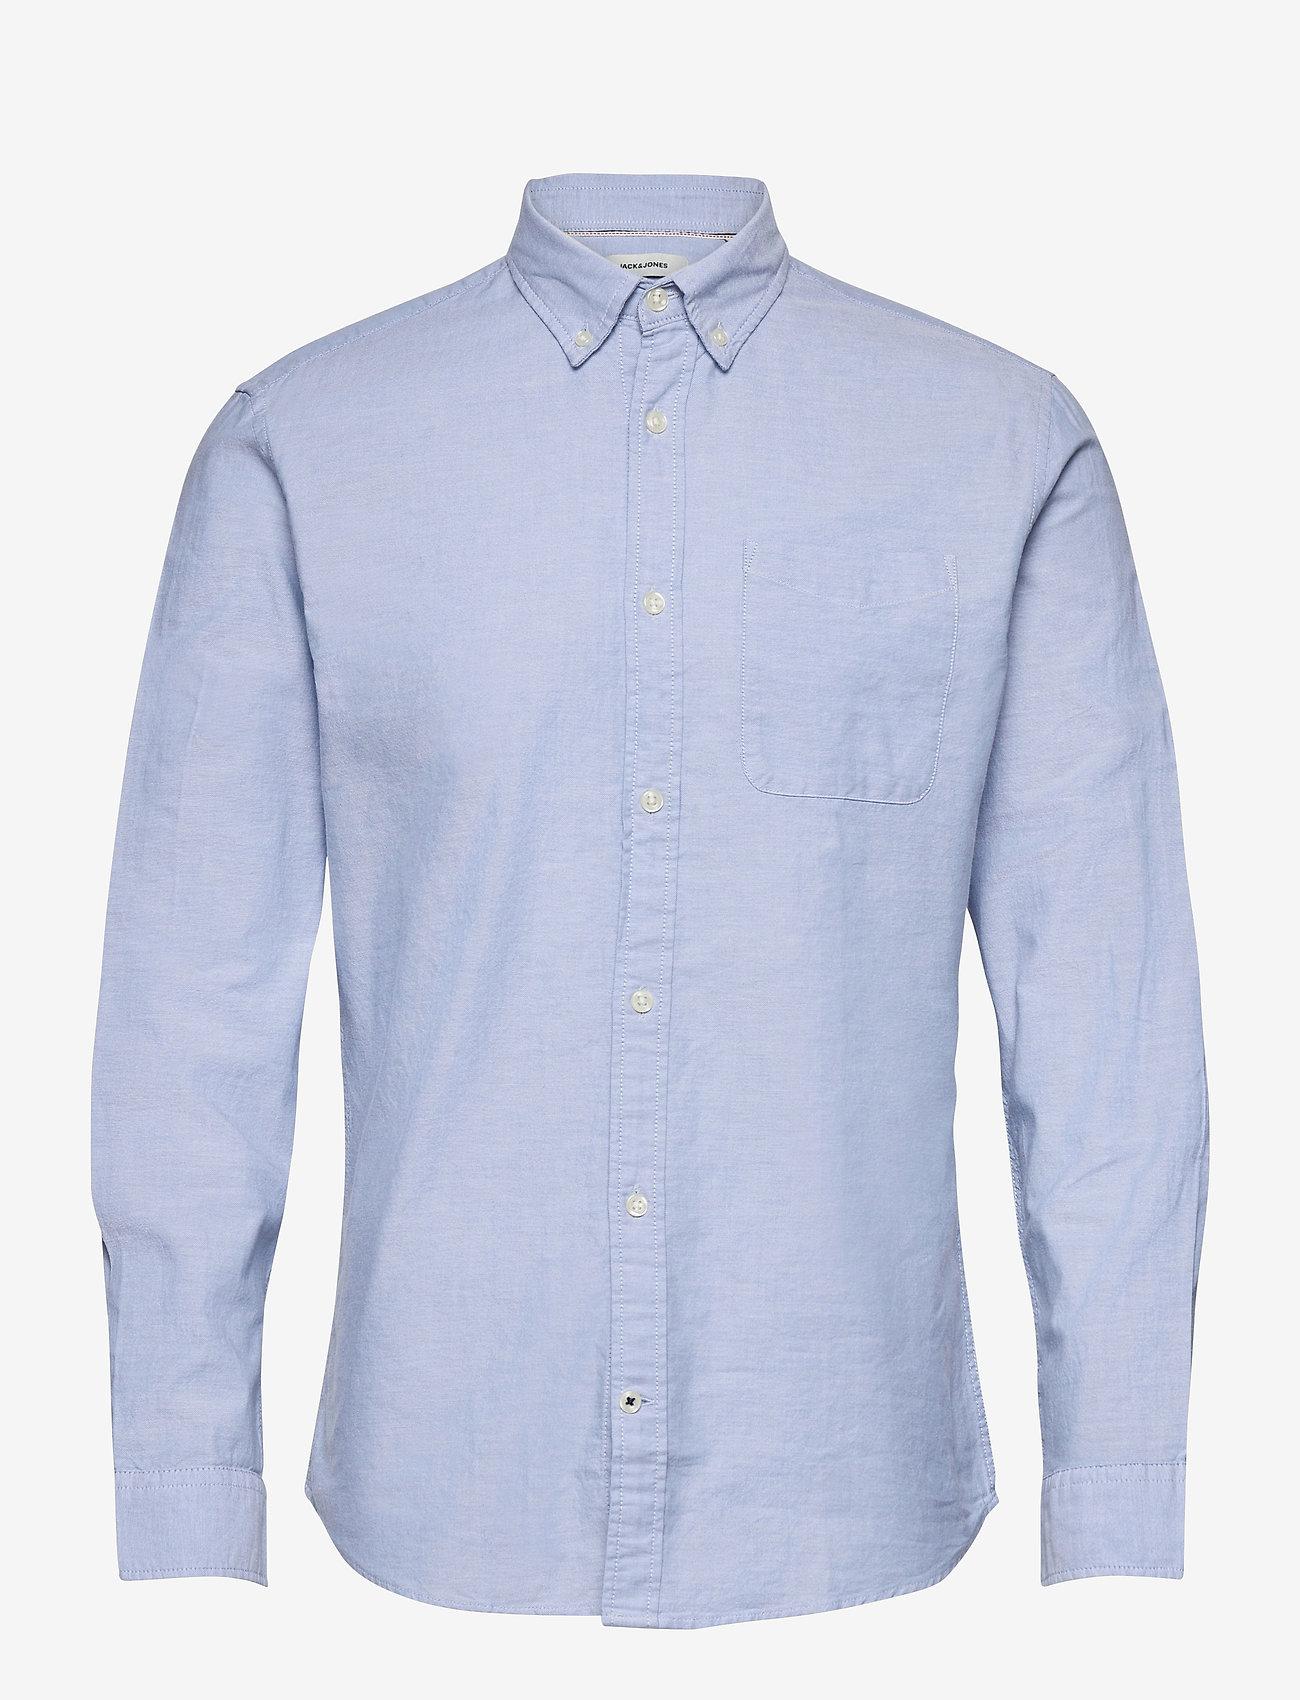 Jack & Jones - JJEOXFORD SHIRT L/S S21 - casual skjortor - cashmere blue - 0